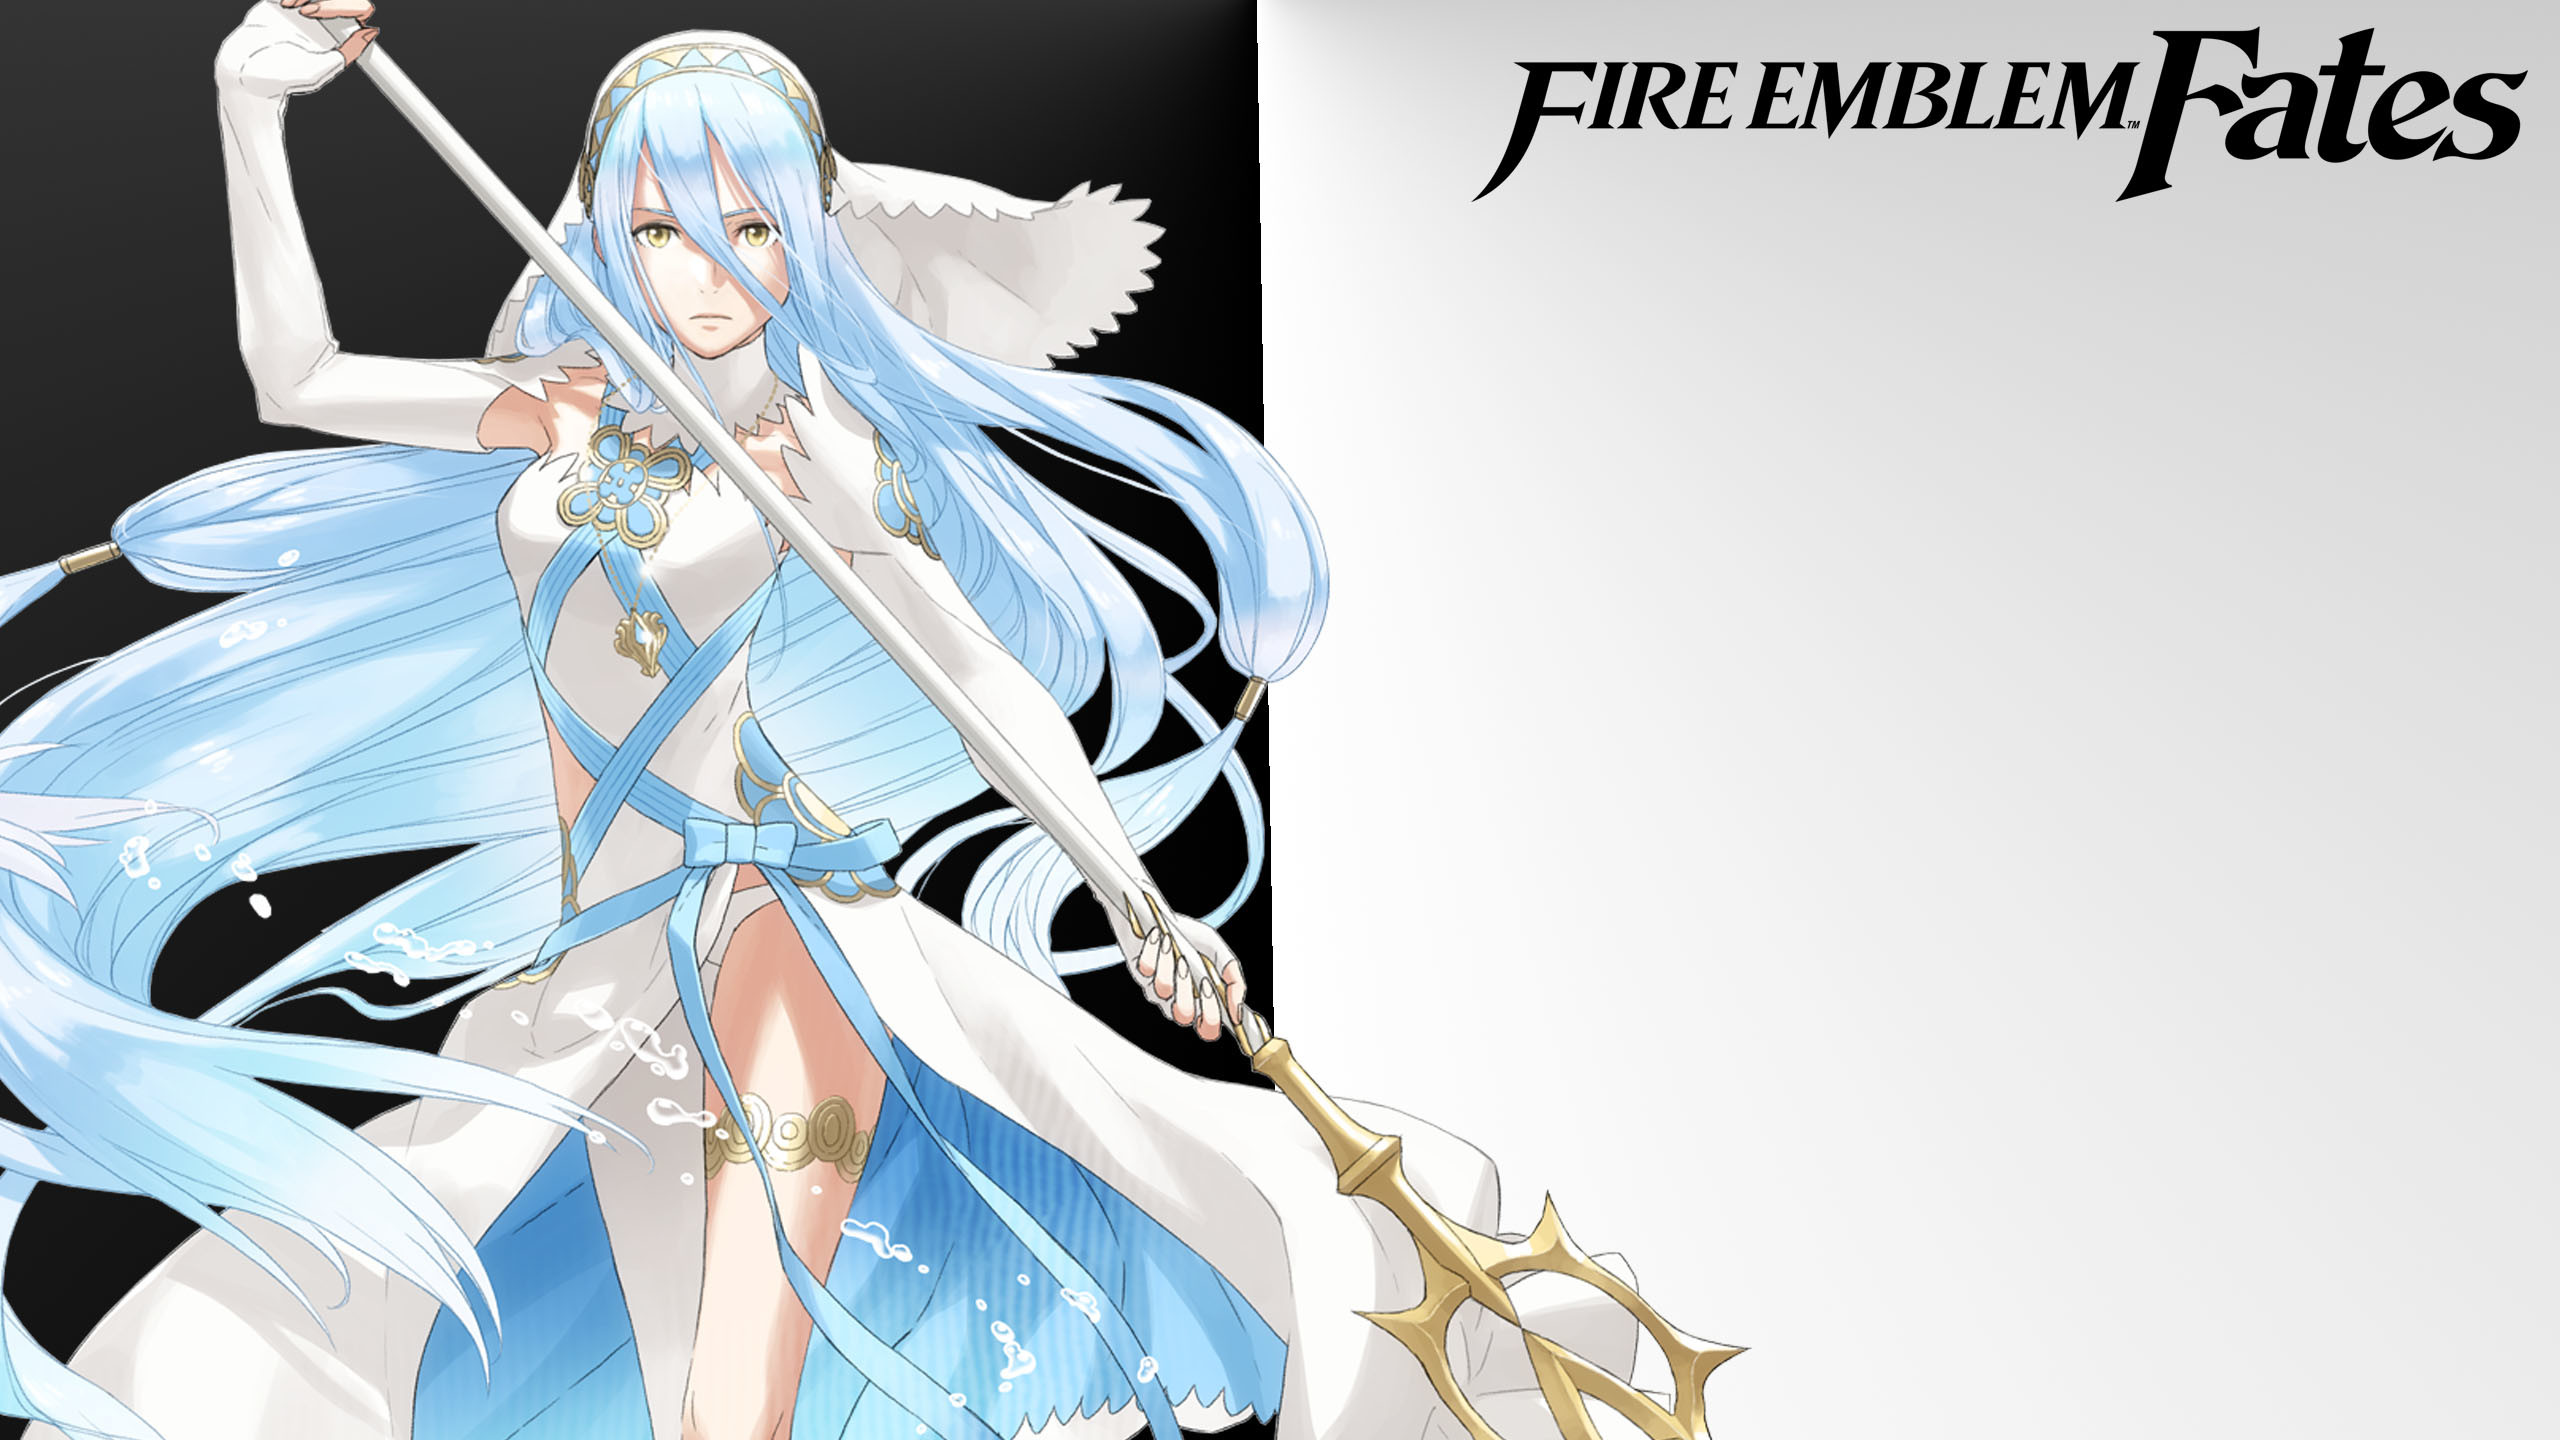 Fire Emblem Fates Wallpaper Full HD #jr10 px 338.53 KB Game